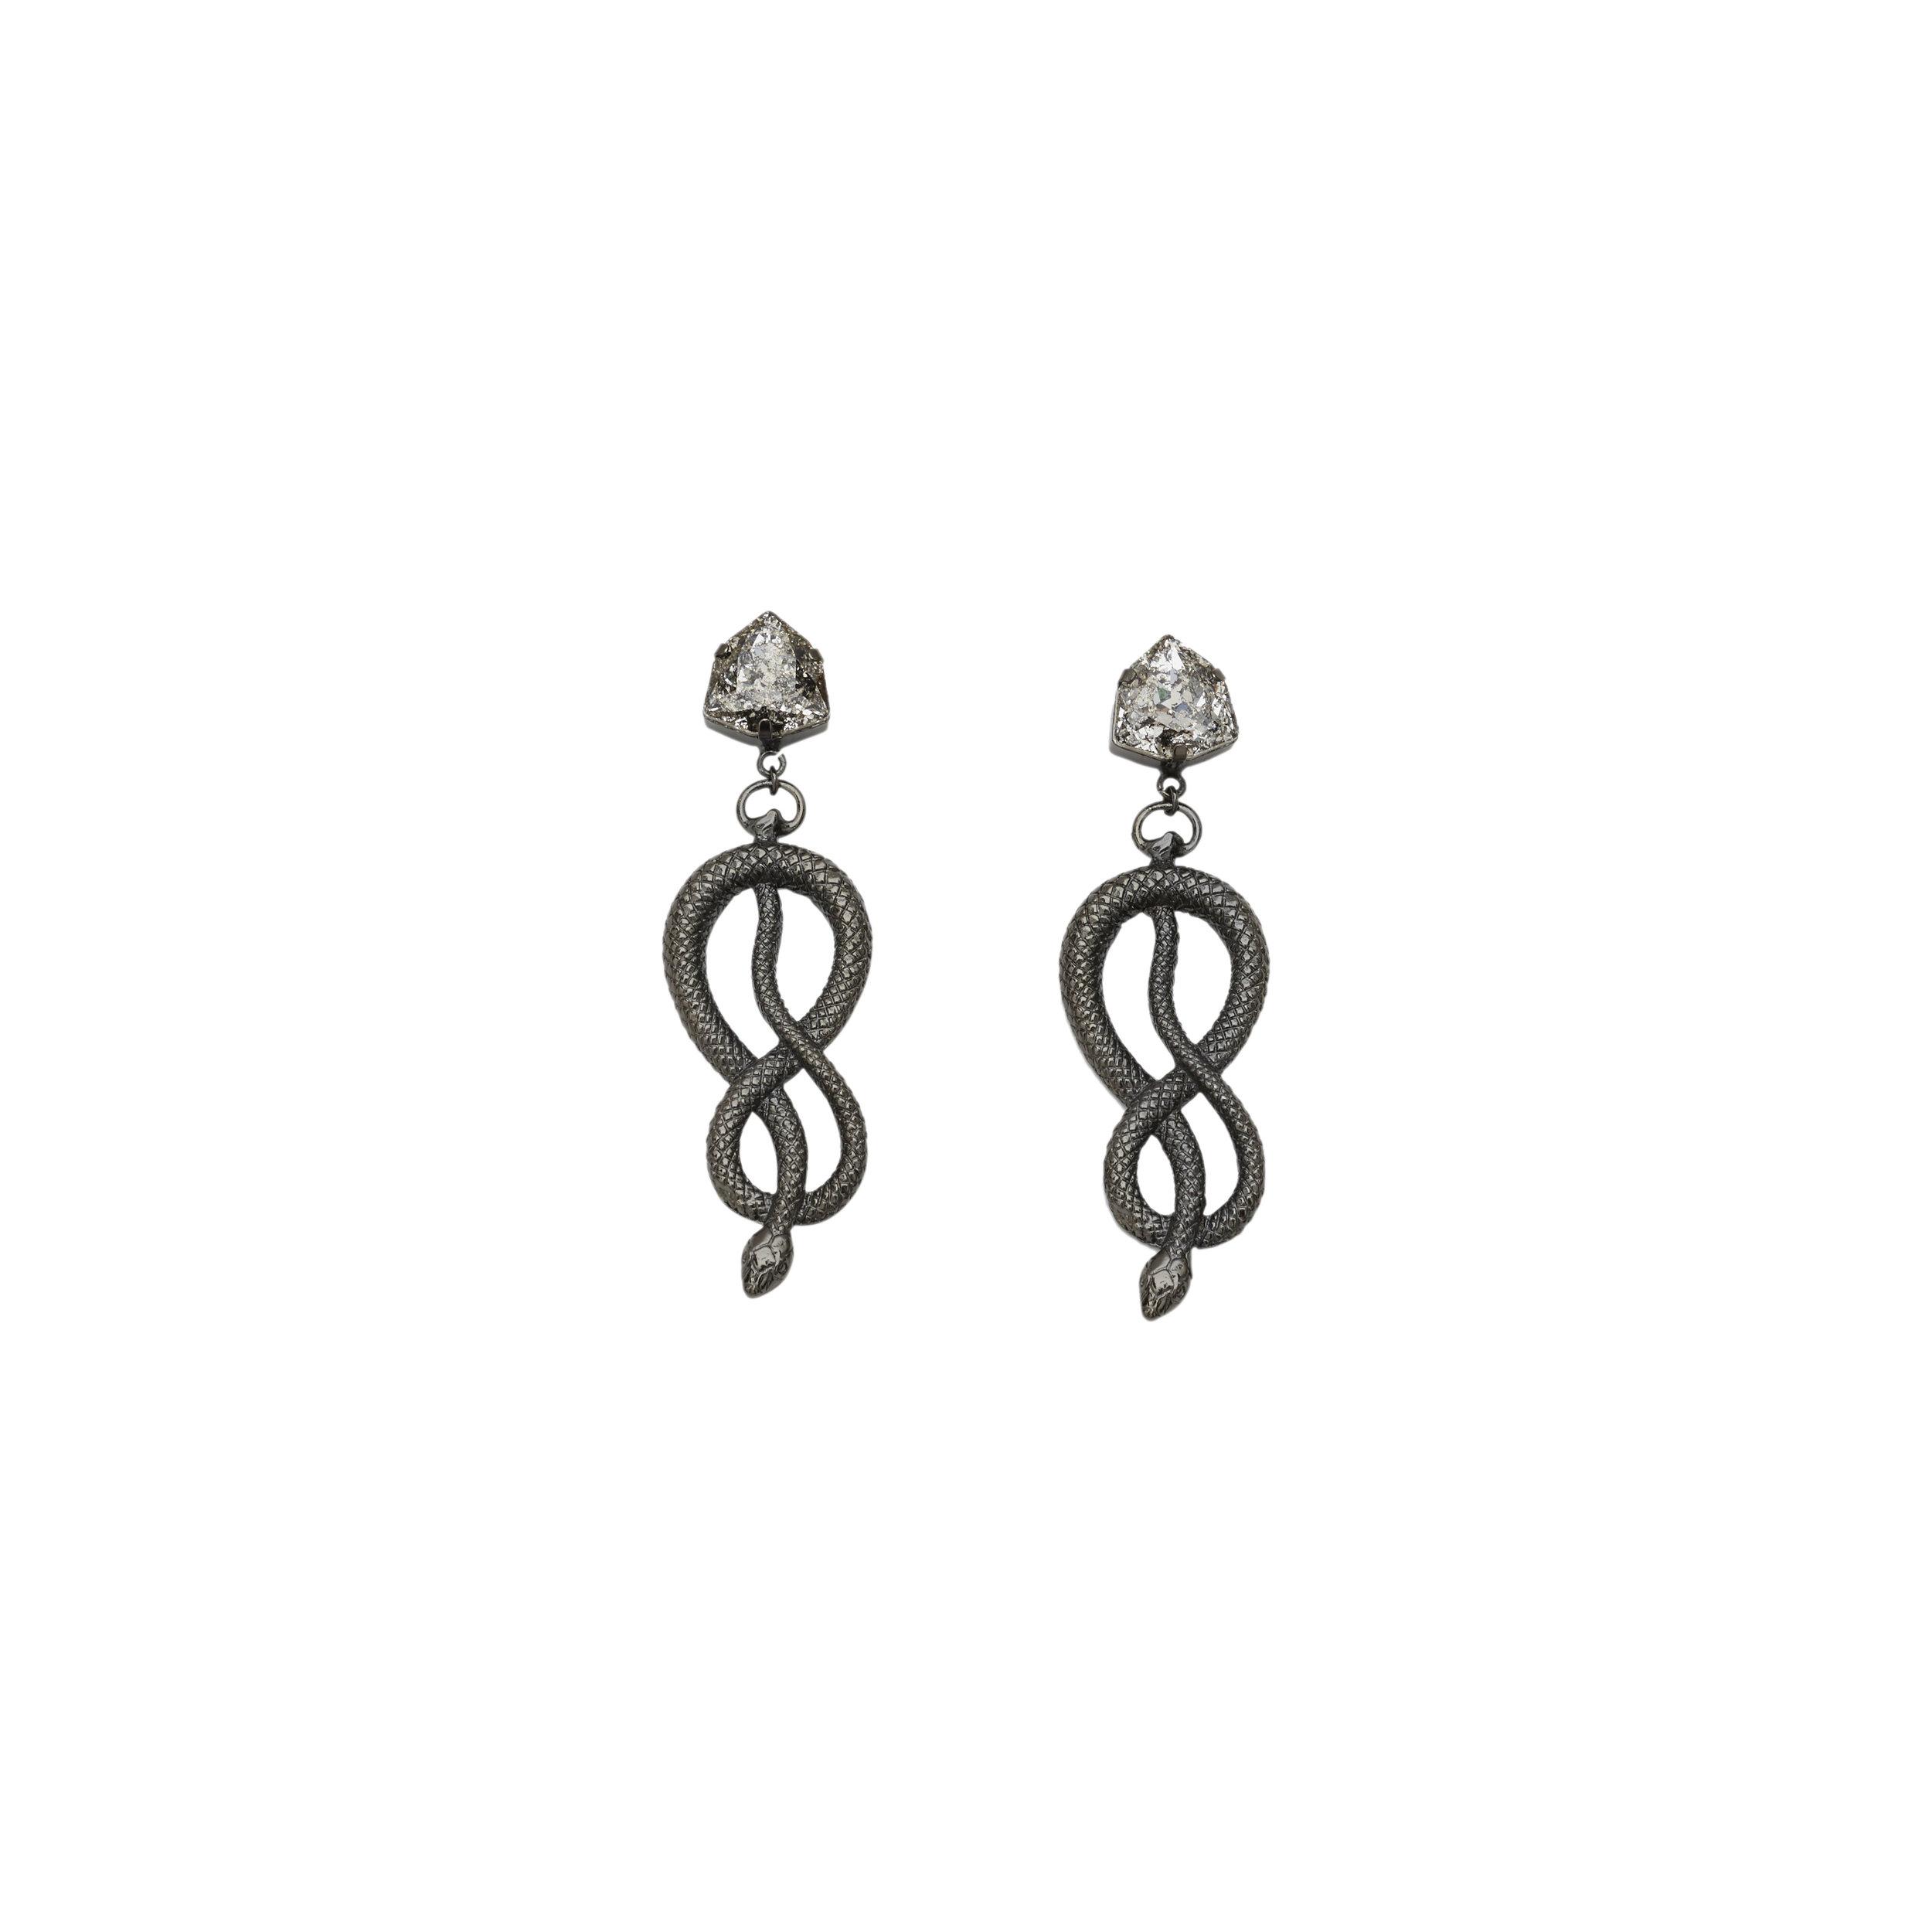 755291309 Knave Gunmetal Earrings. Balyck Knave Gun.jpg